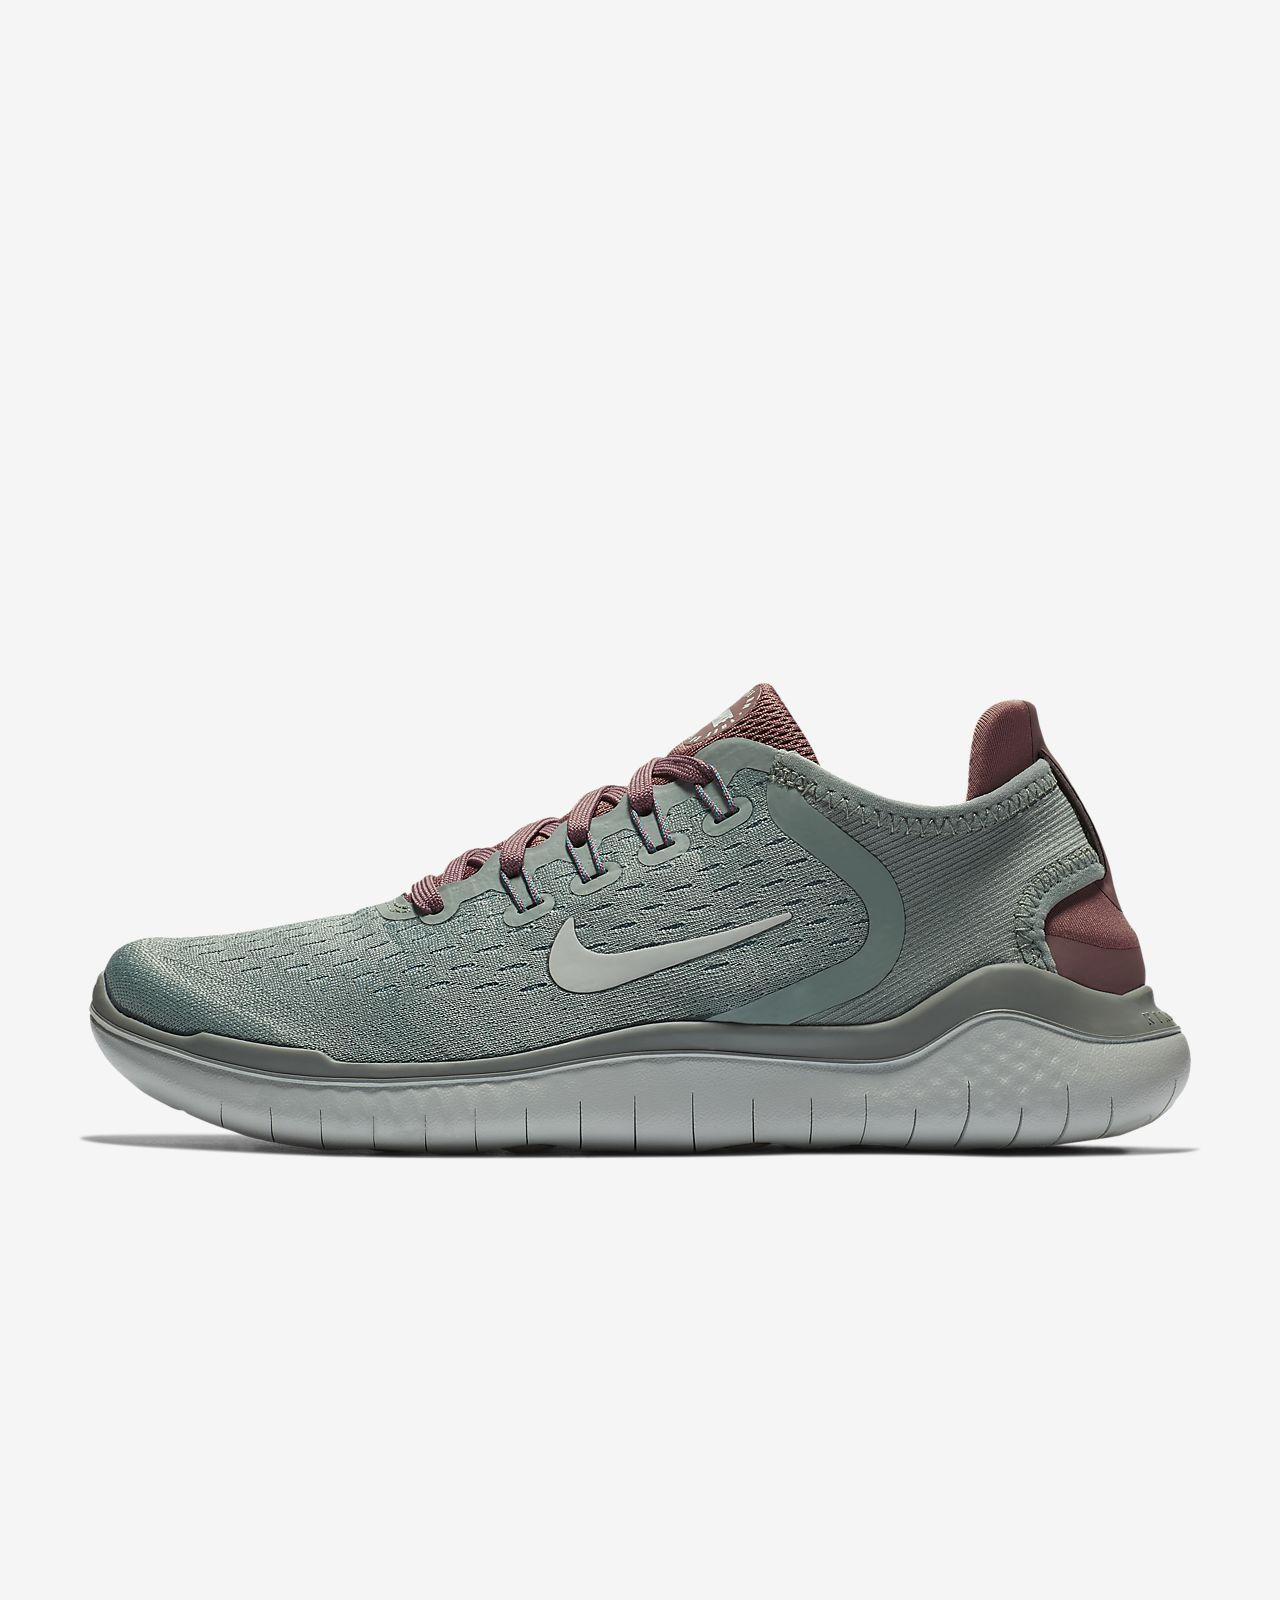 0389a2d42aead5 Nike Free RN 2018 Women s Running Shoe. Nike.com